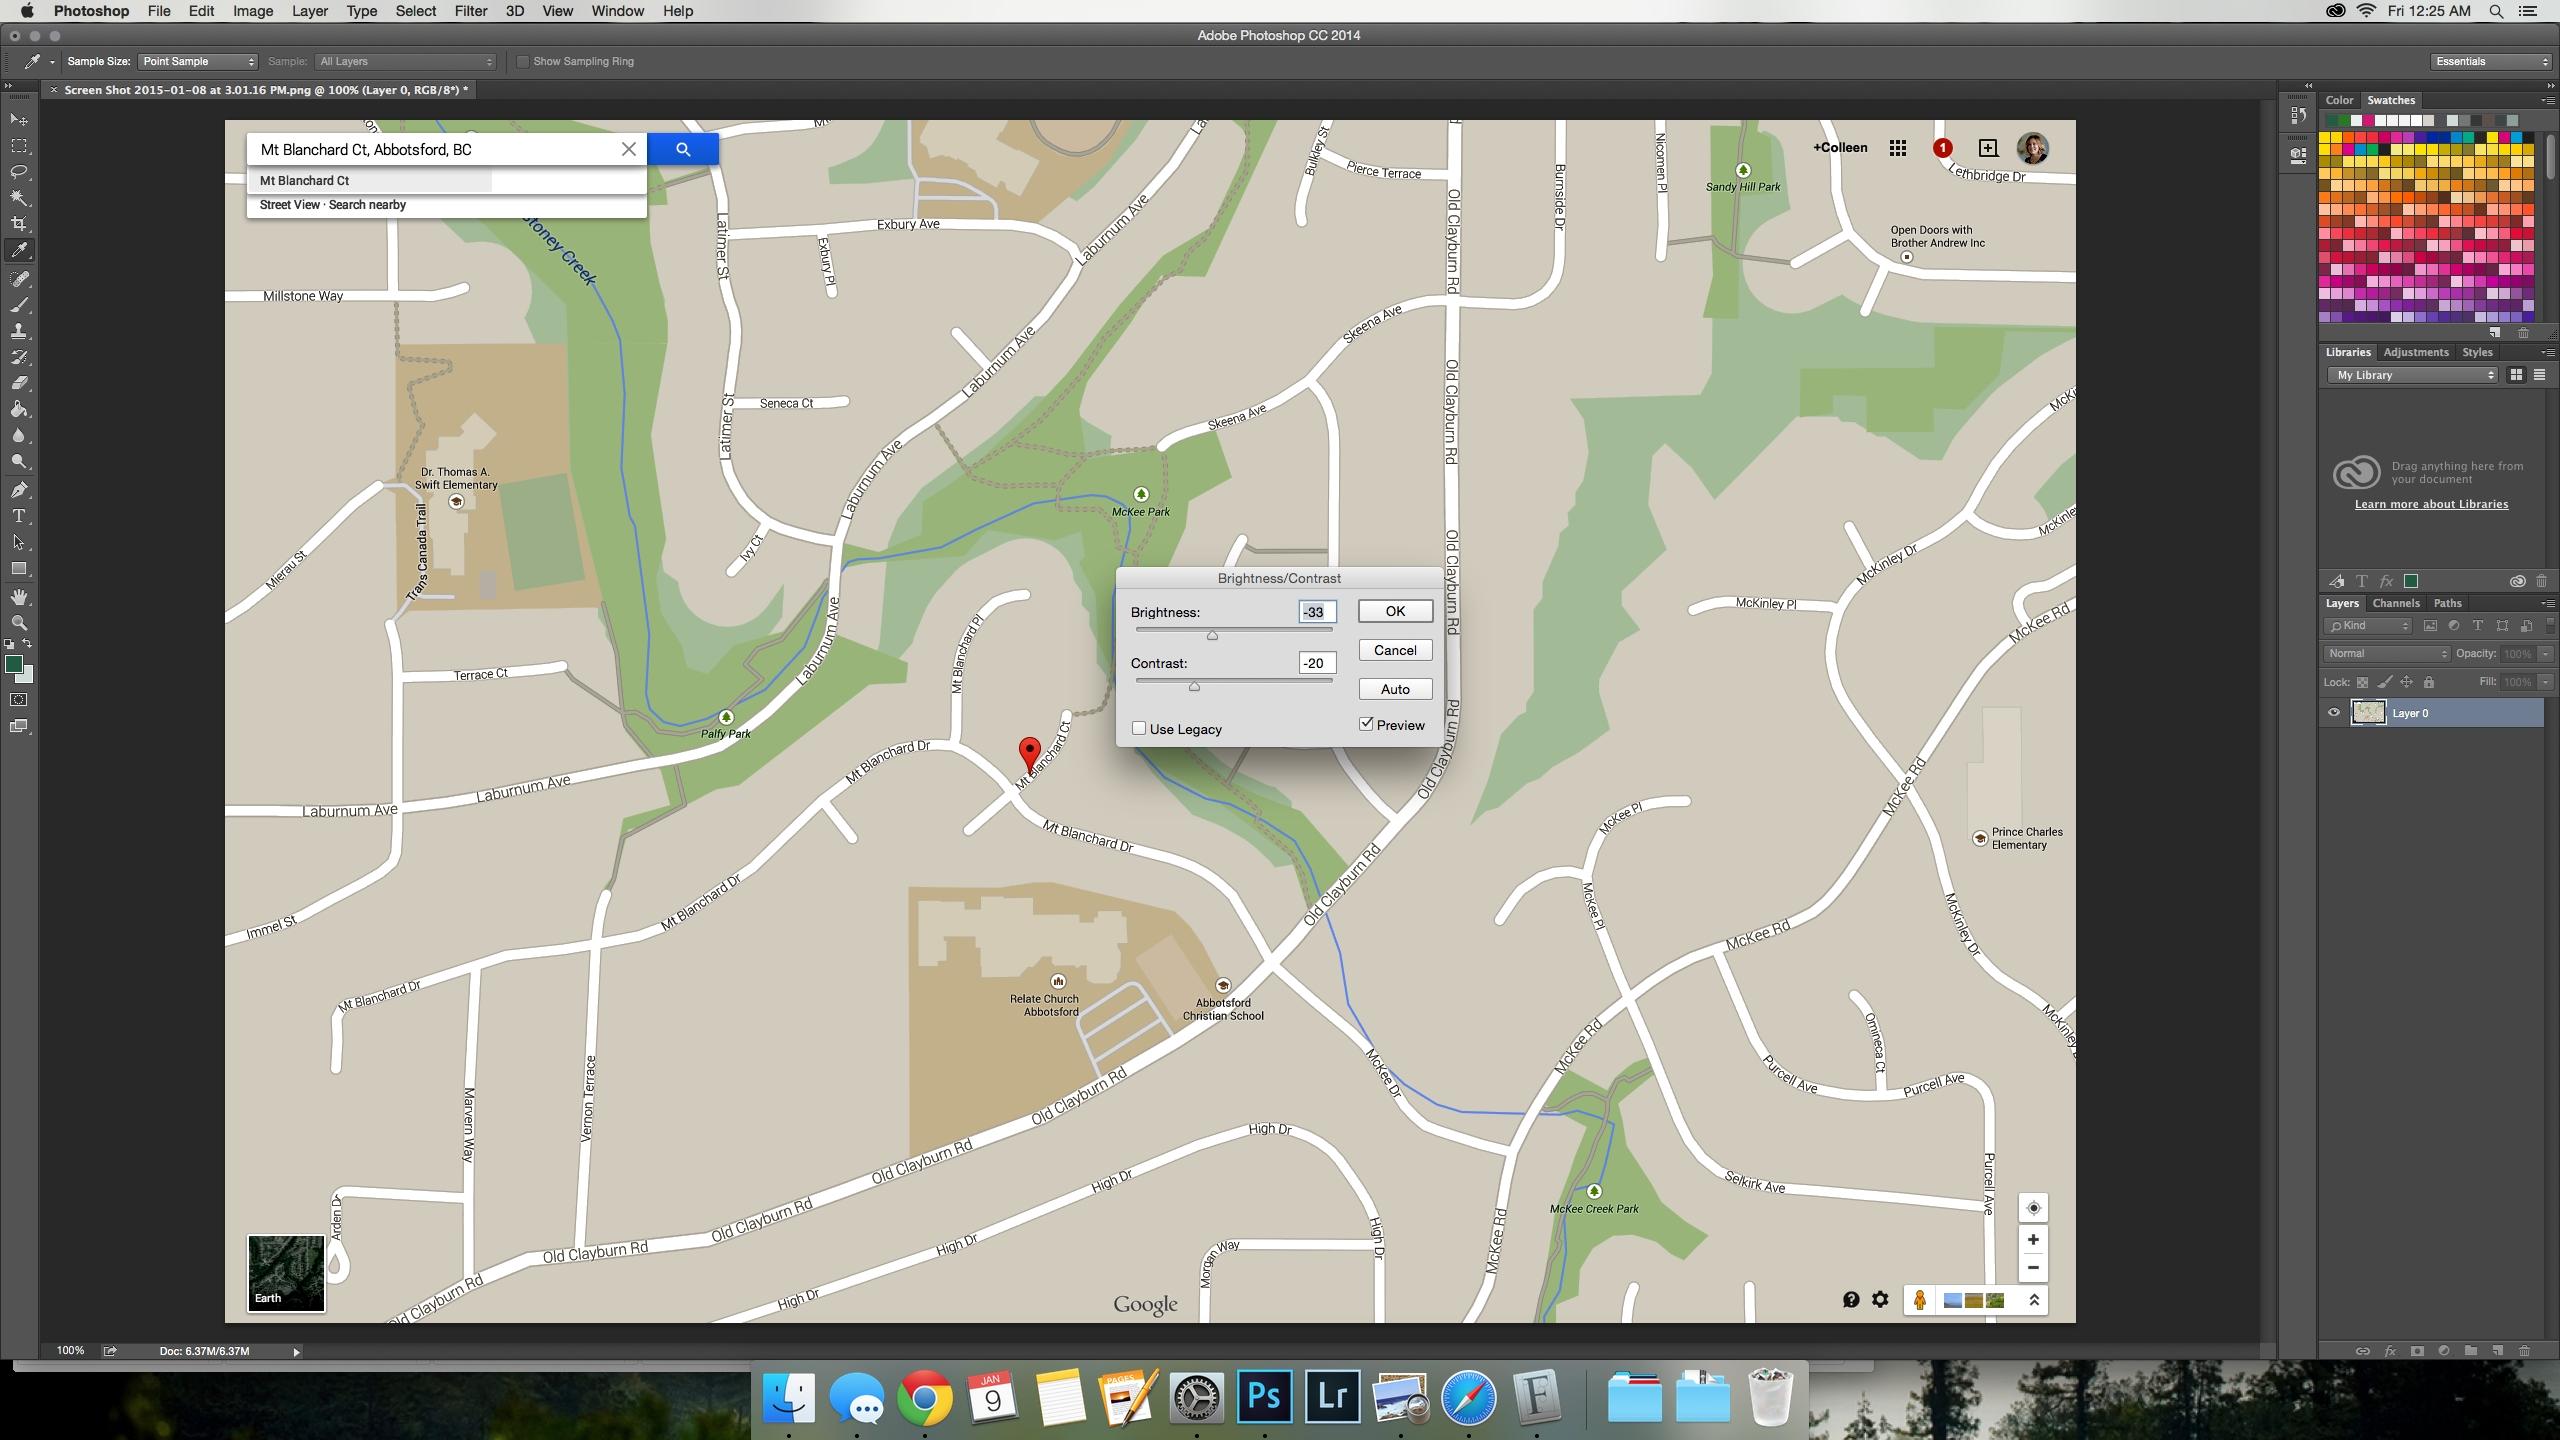 Diy Custom Street Maps Wall Art – Lemon Thistle Intended For Most Popular Street Map Wall Art (View 16 of 20)